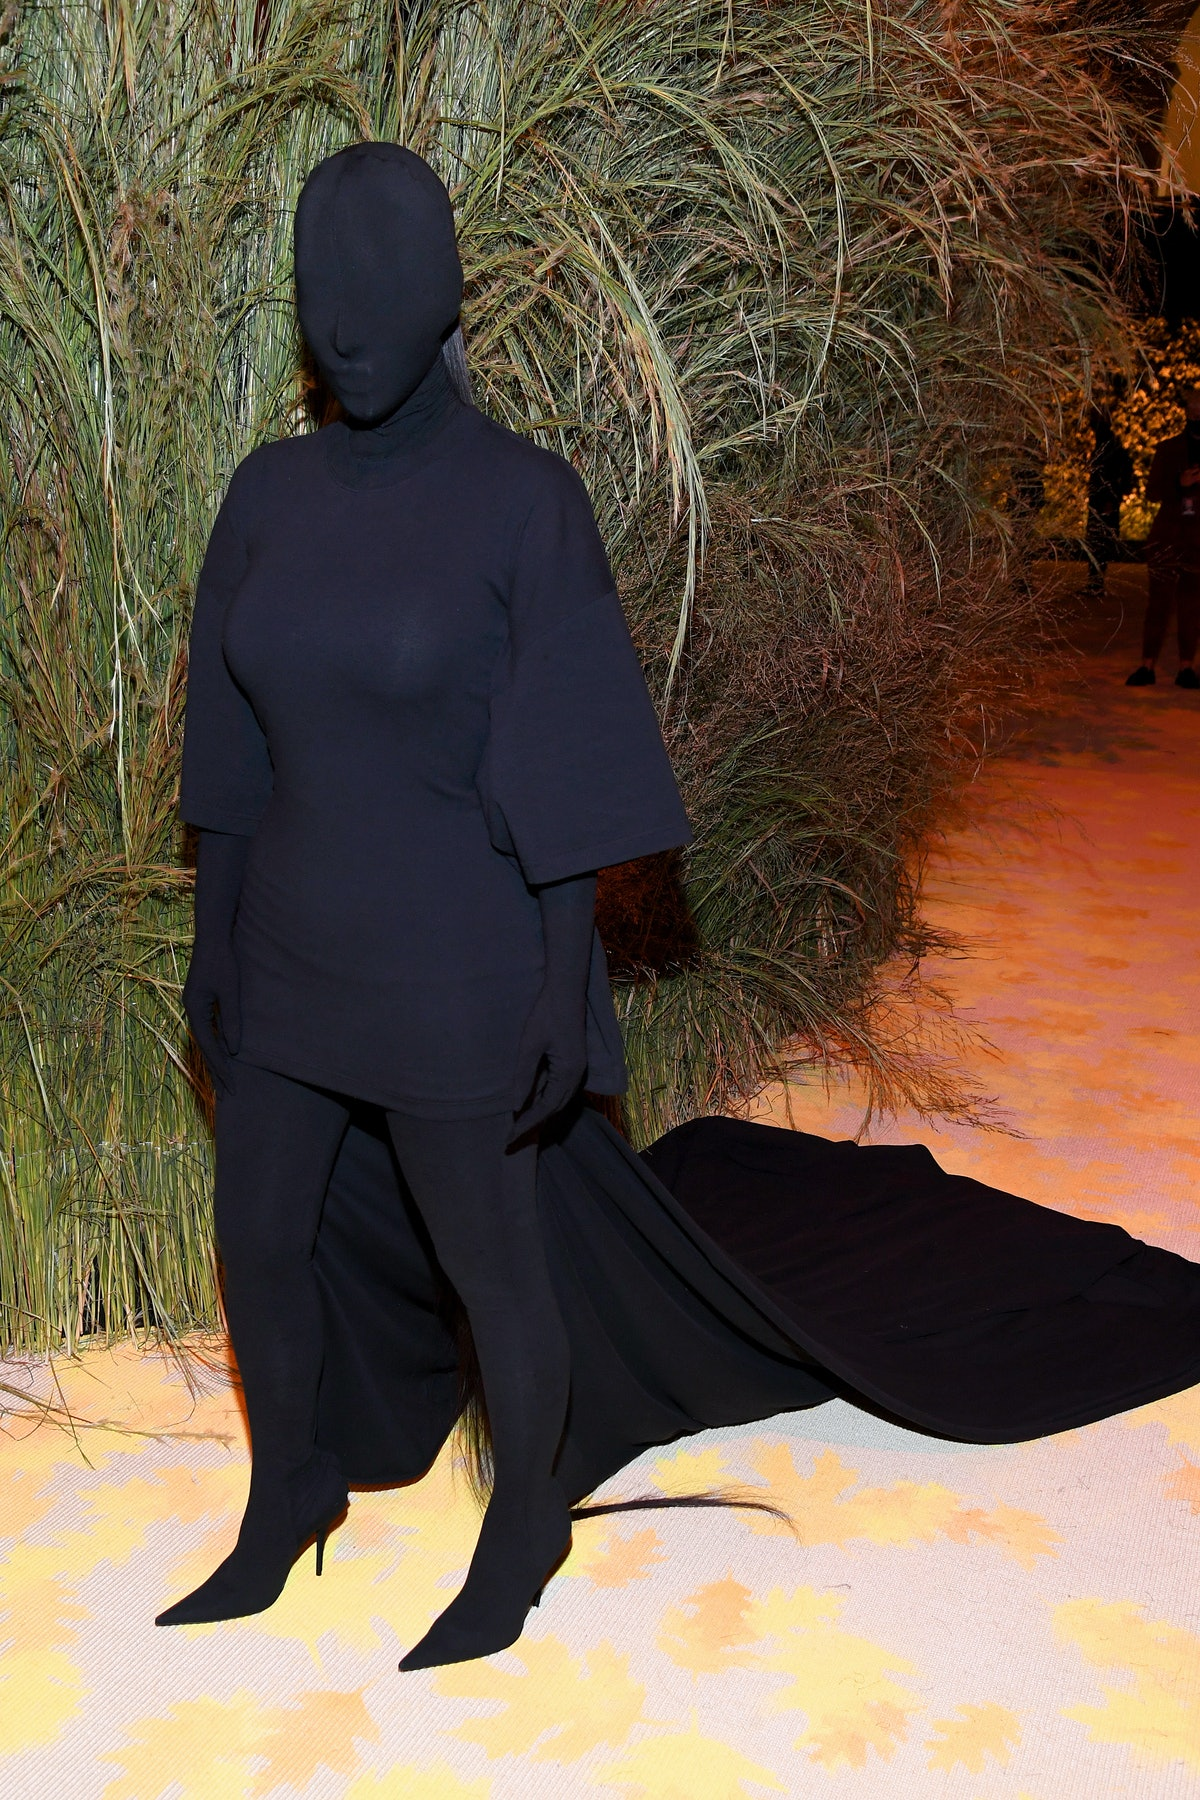 Kim Kardashian attends The 2021 Met Gala.